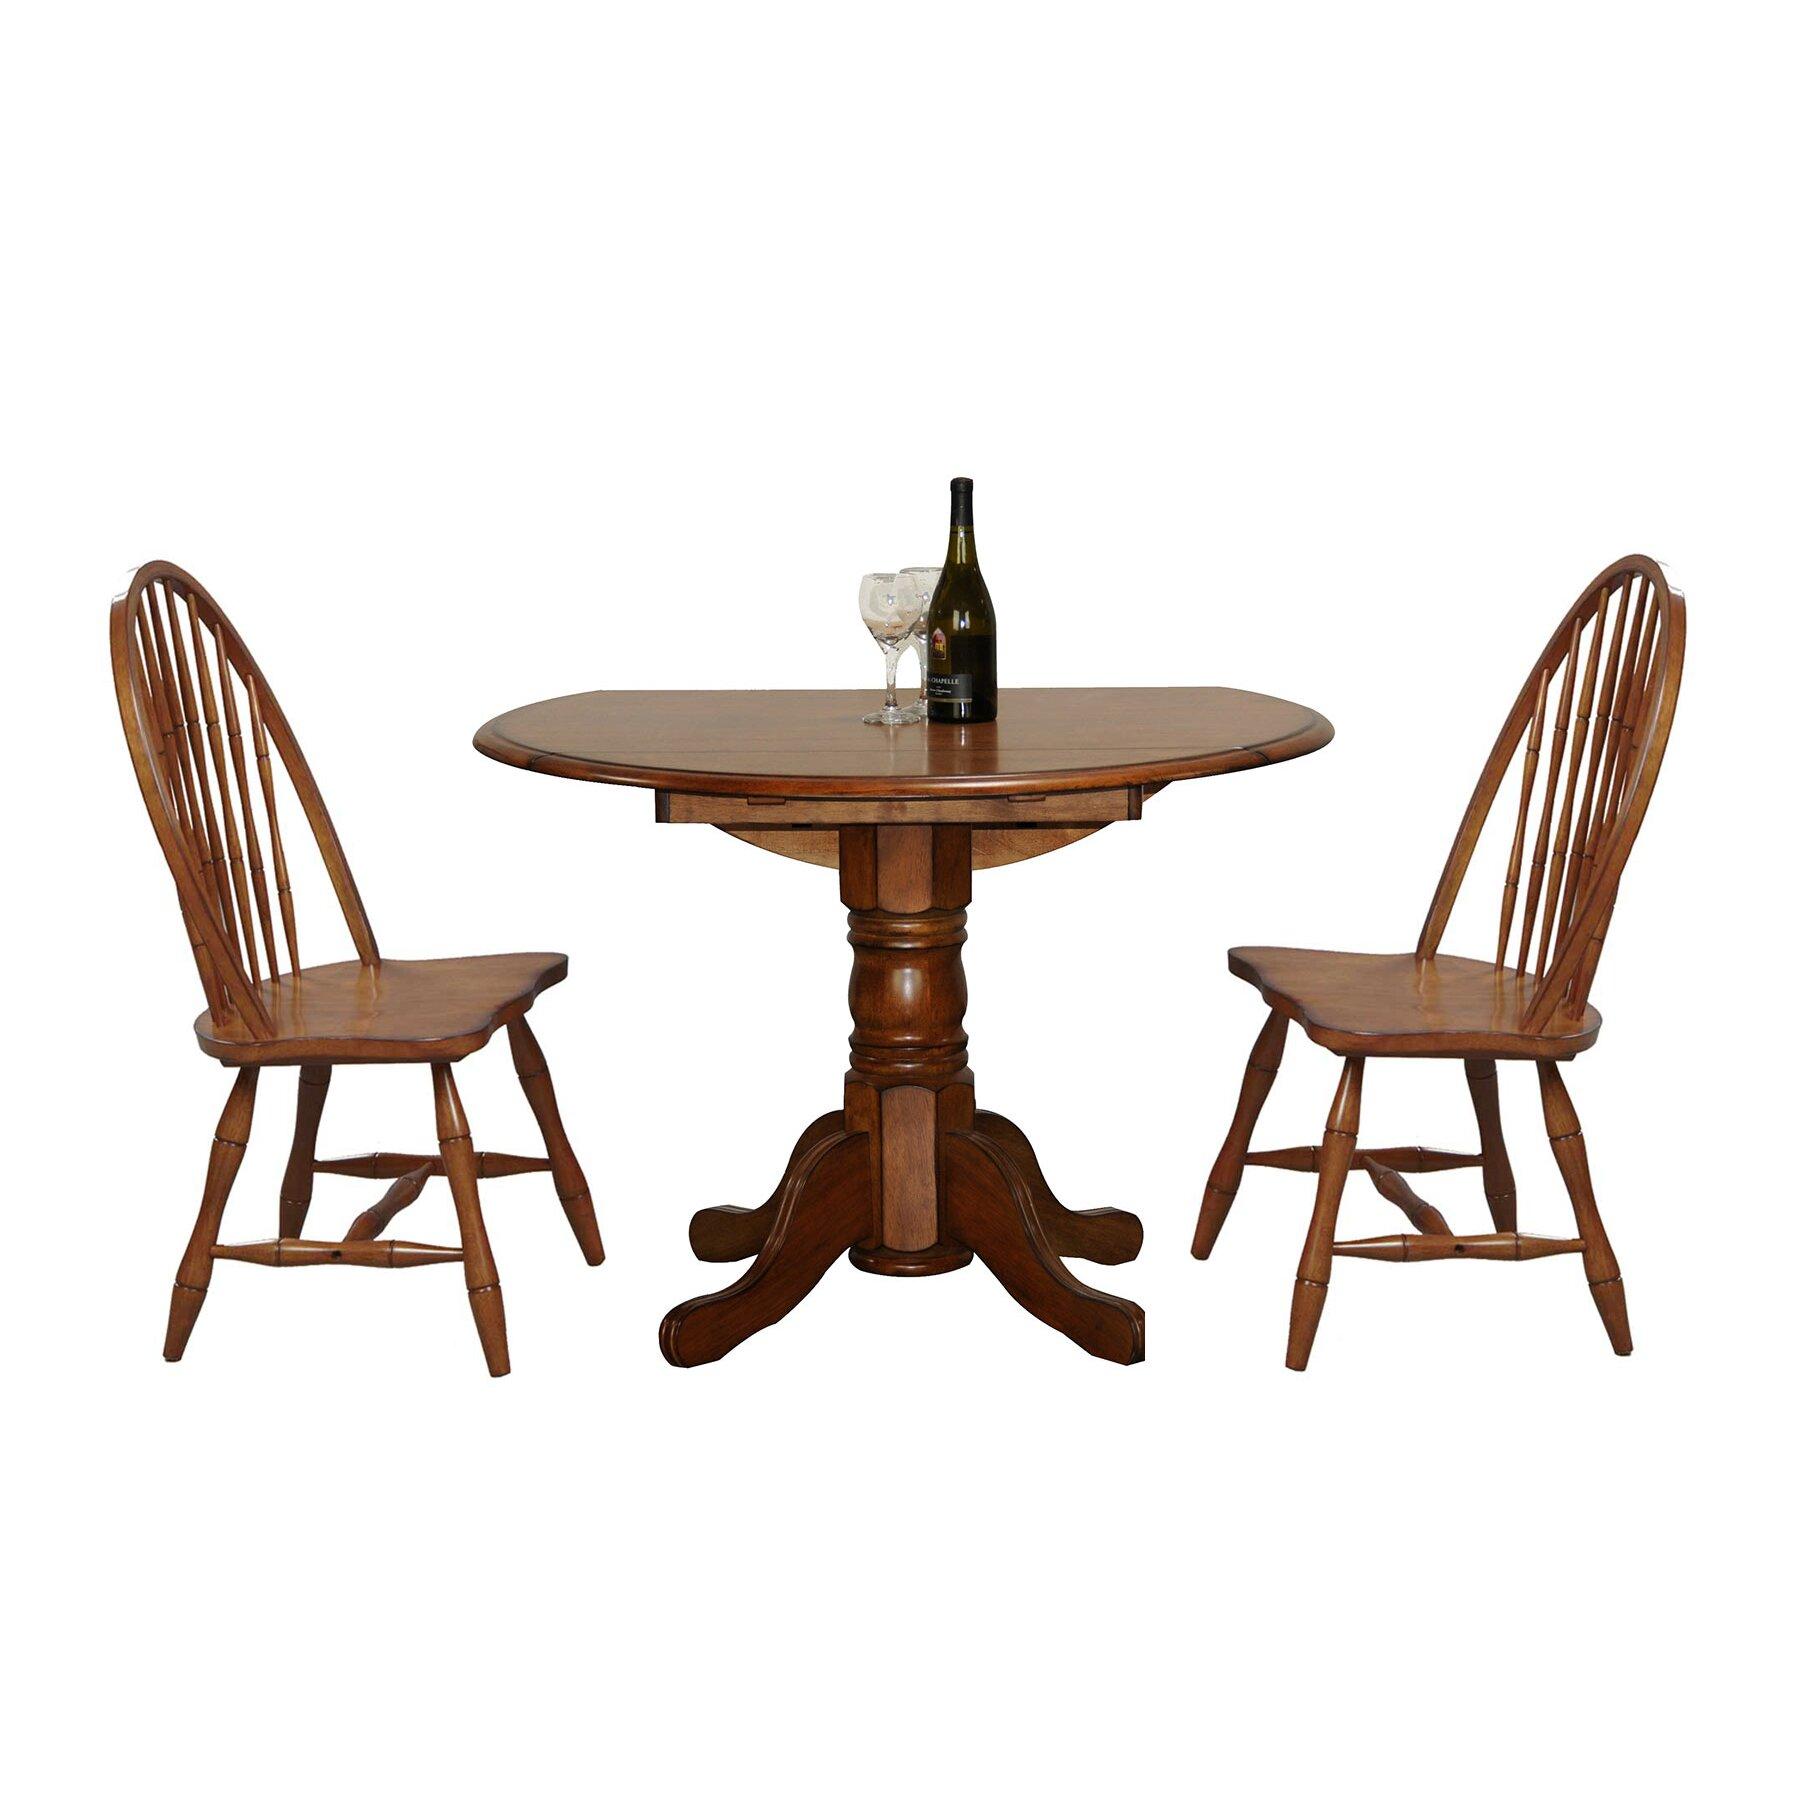 Alcott hill blackwell dining table reviews wayfair for Wayfair dining table